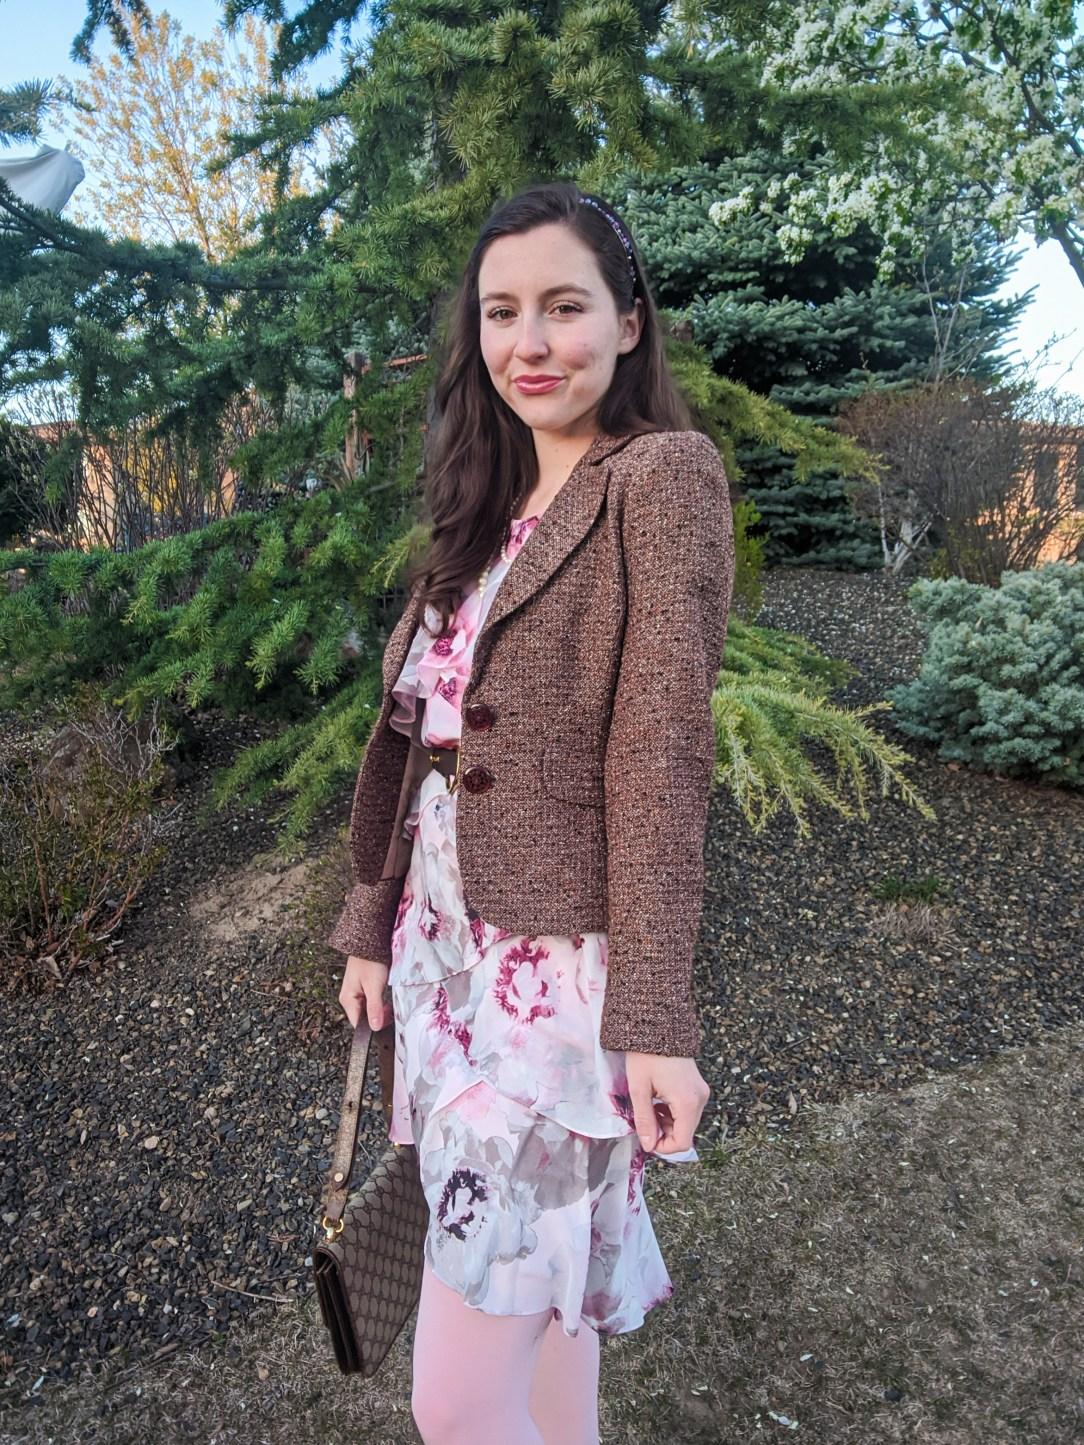 tweed blazer, tiered dress, Blair Waldorf style